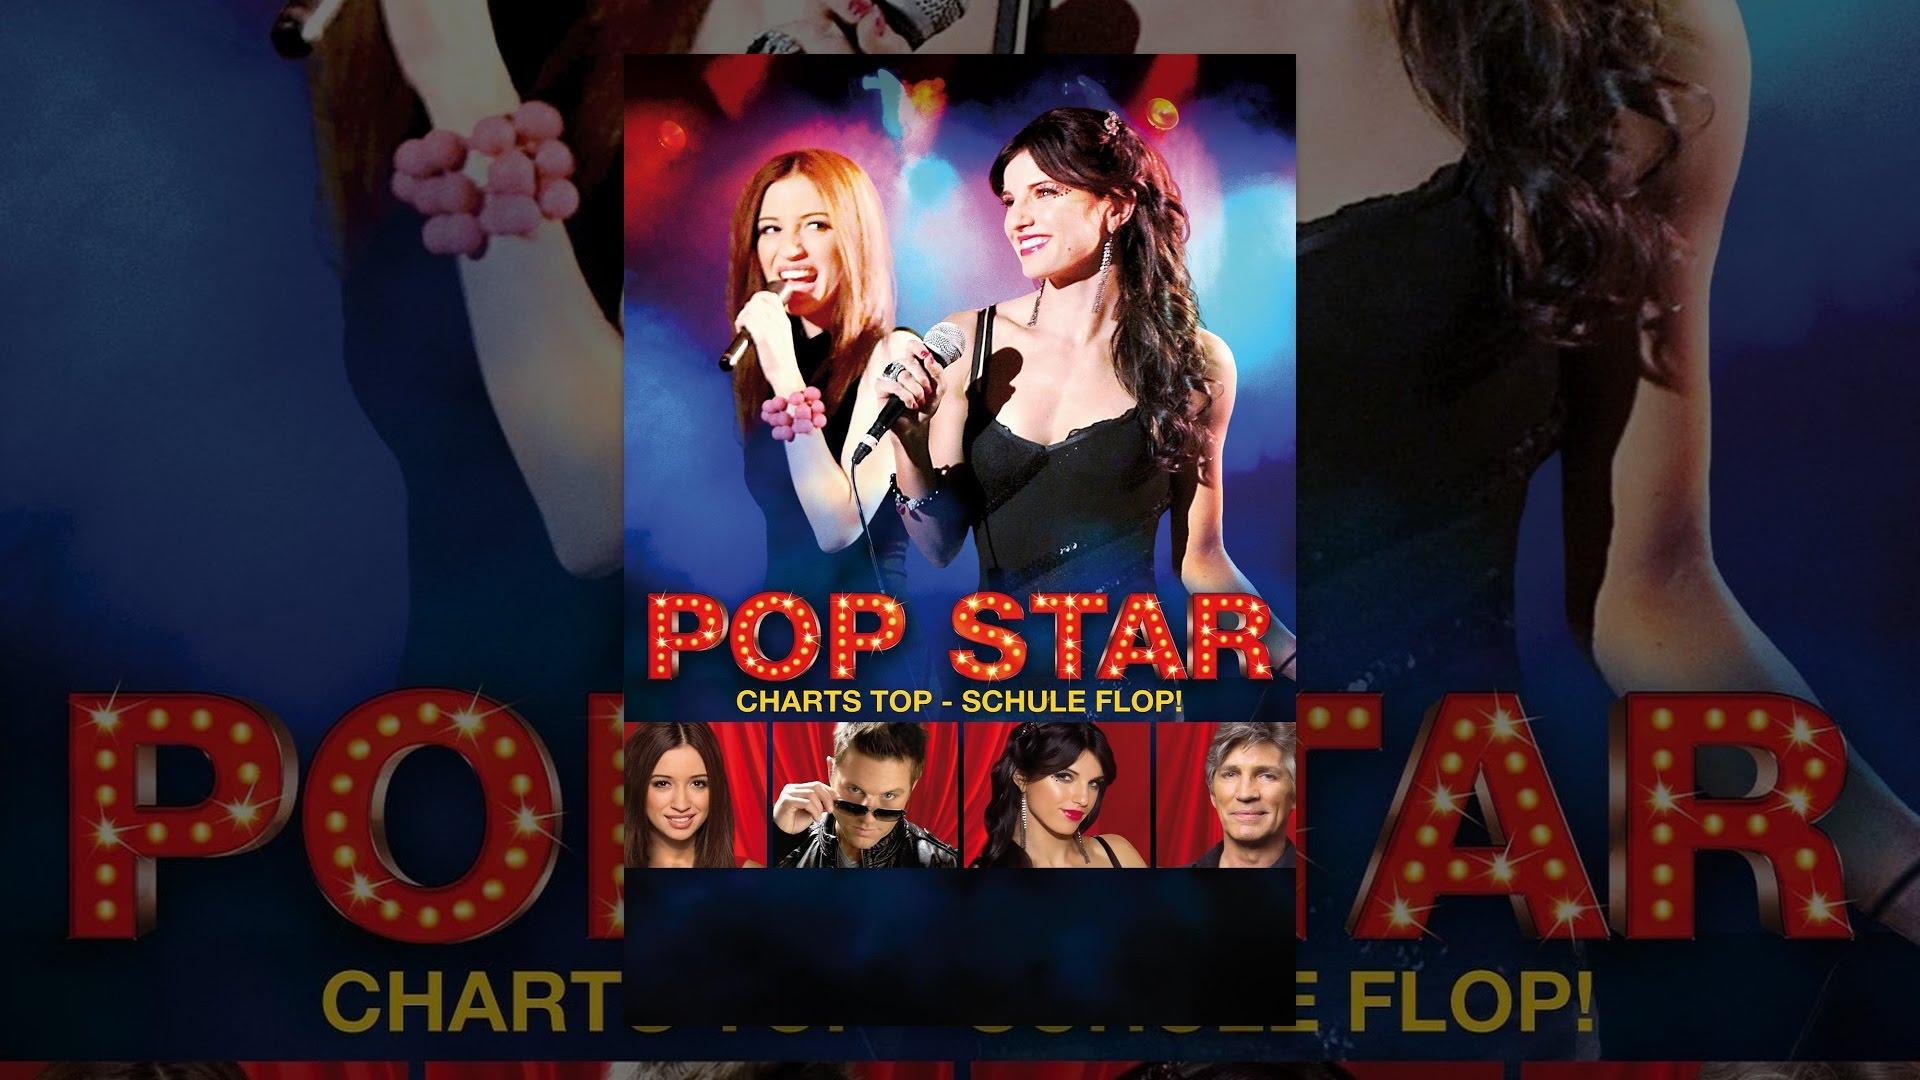 Pop Star Charts Top Schule Flop